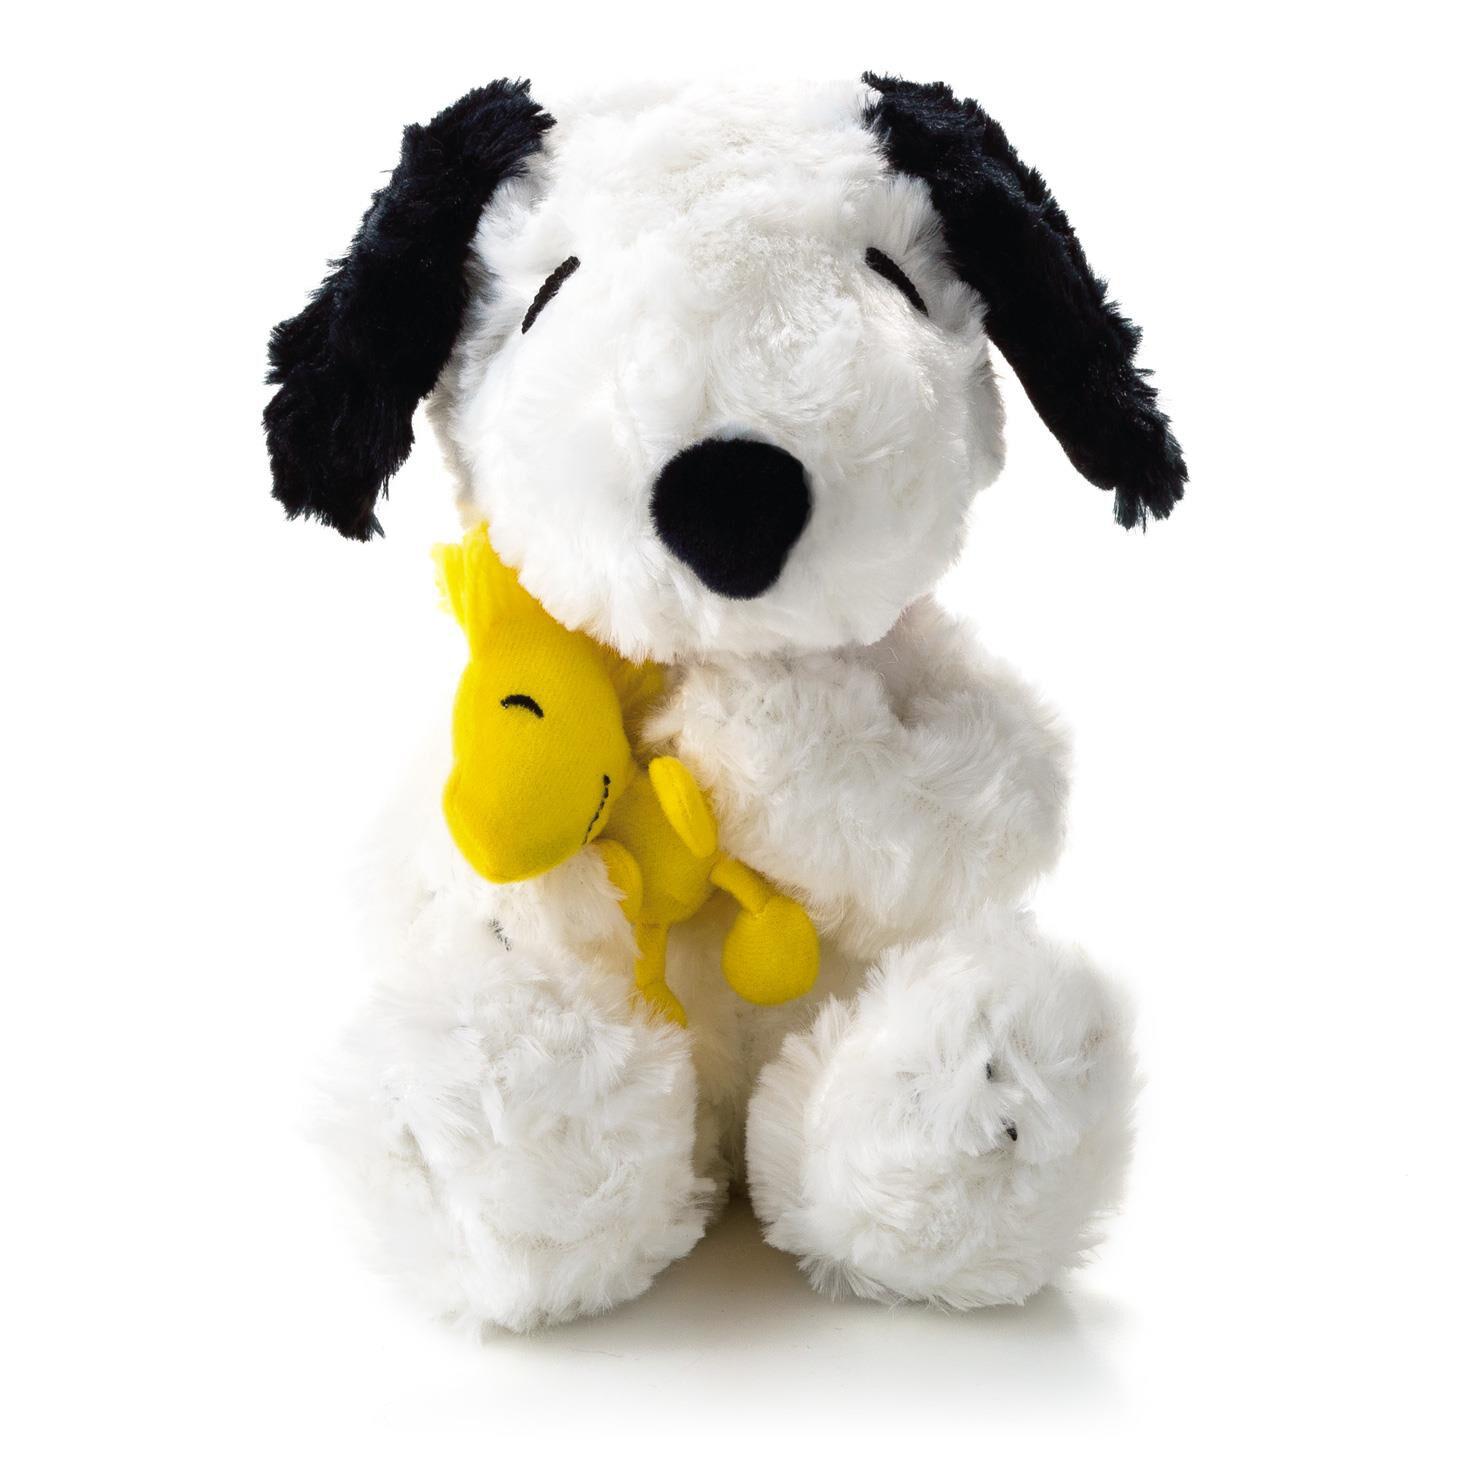 Woodstock Snoopy